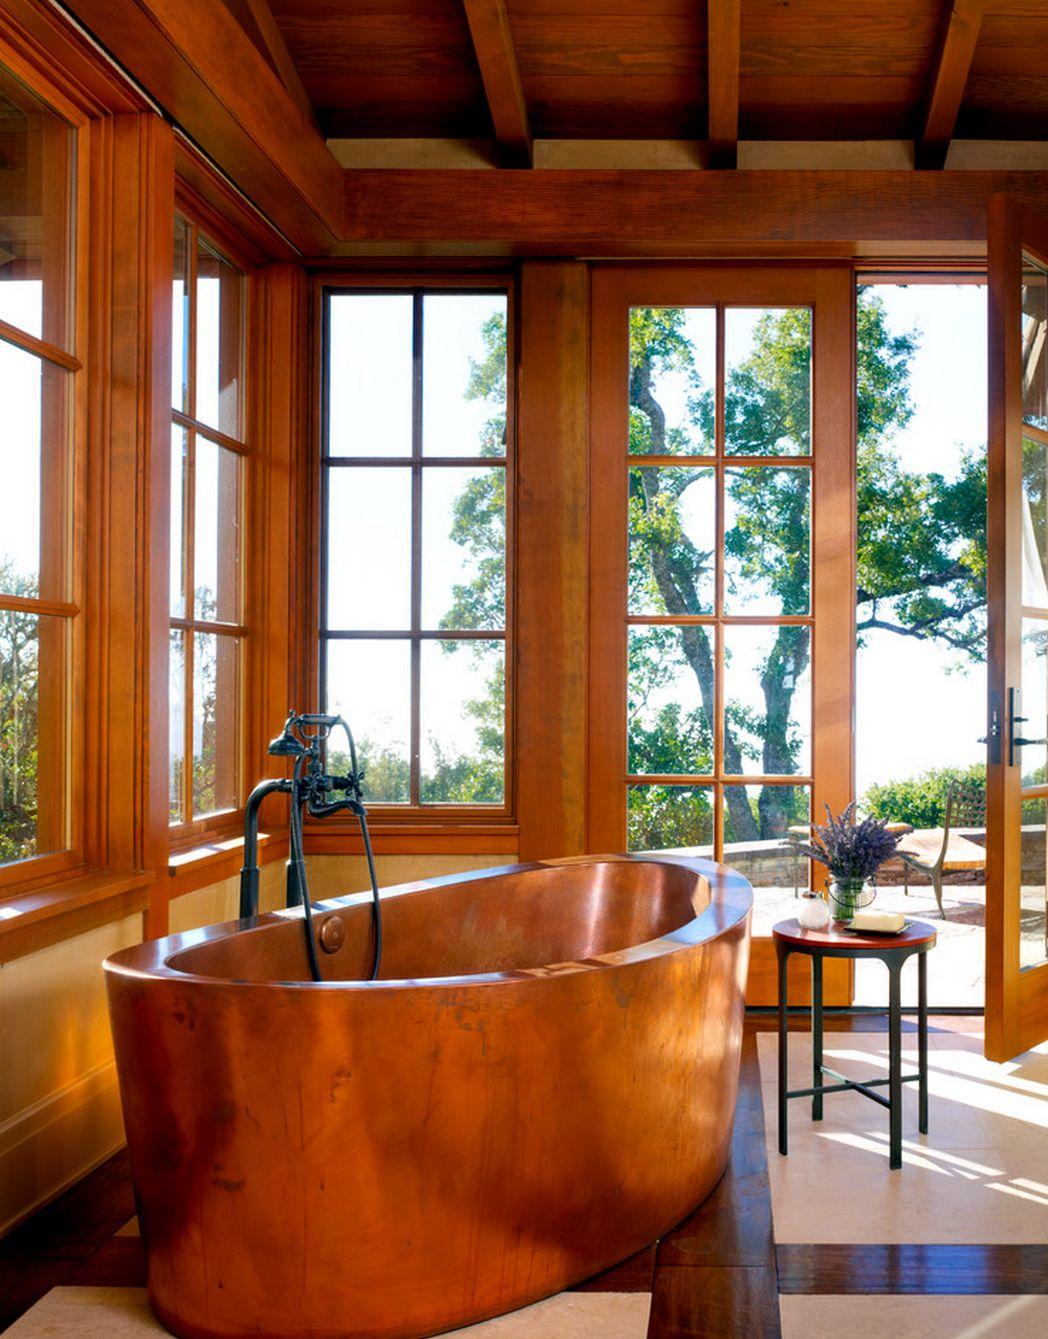 diamond spas japanese soaking tub.  ARTmetal Ideas Www Aias Se Copper Soaking Tub By Diamond Spas